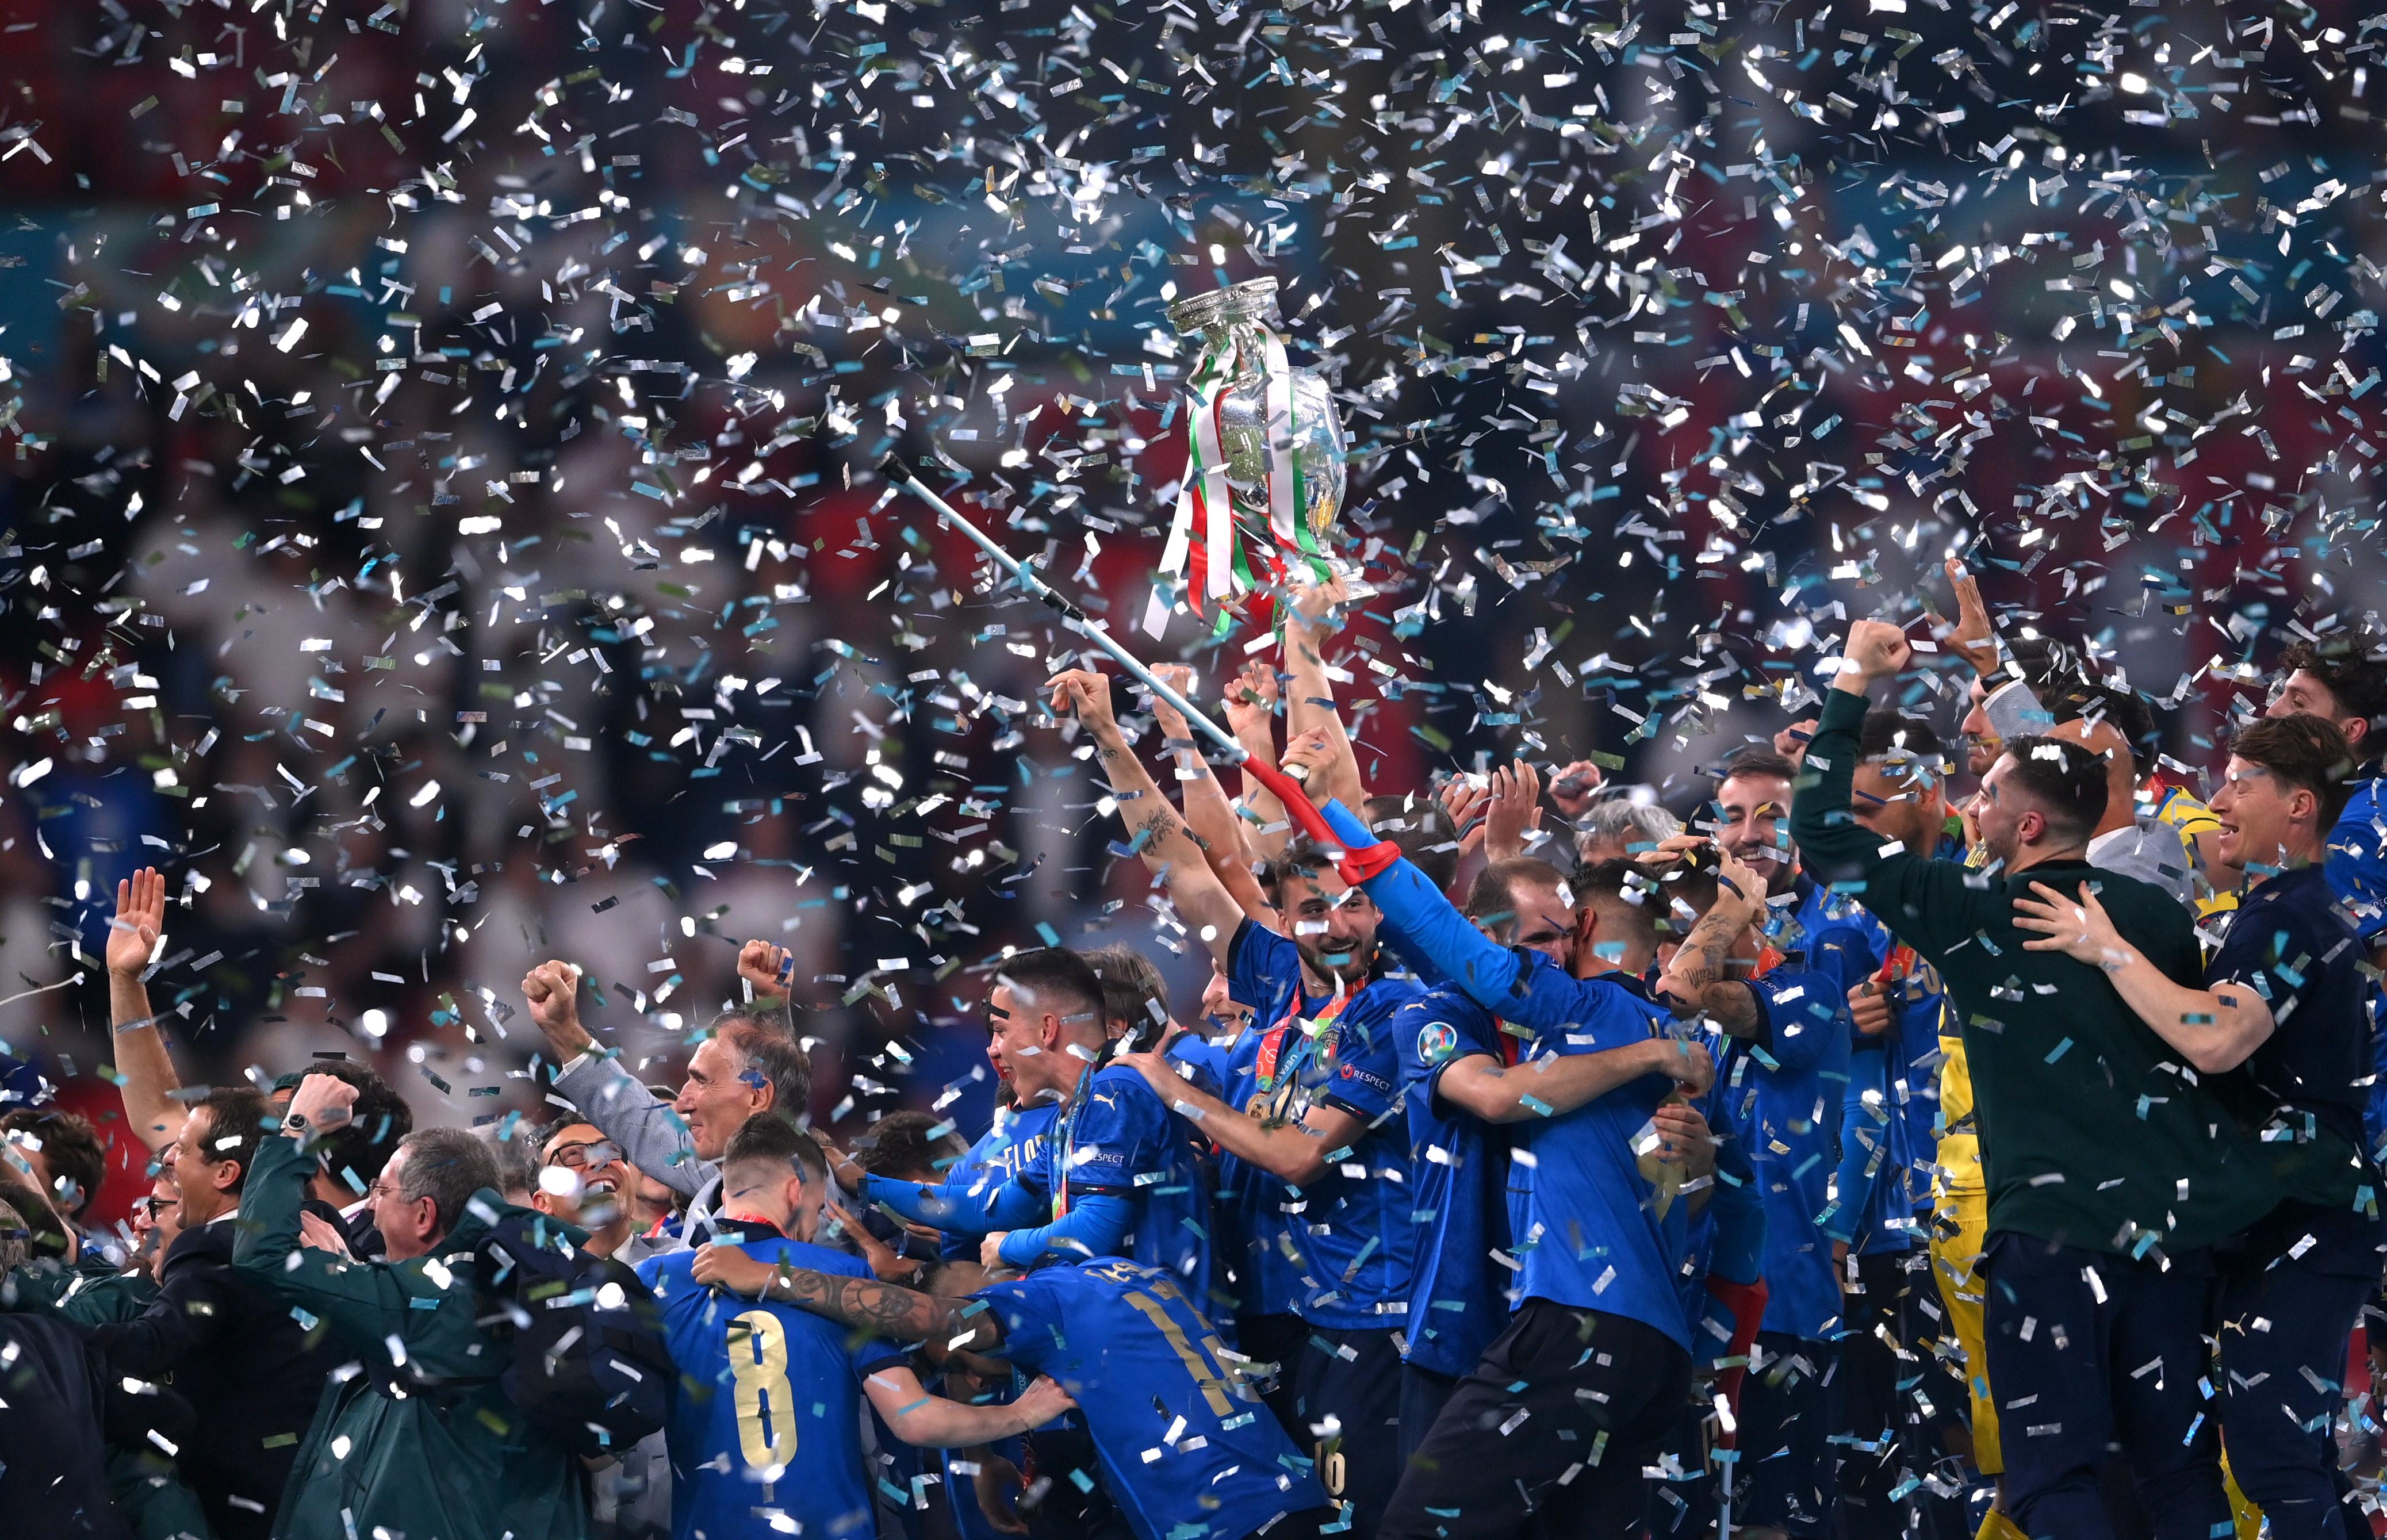 EURO 2020, η νίκη της Ευρώπης